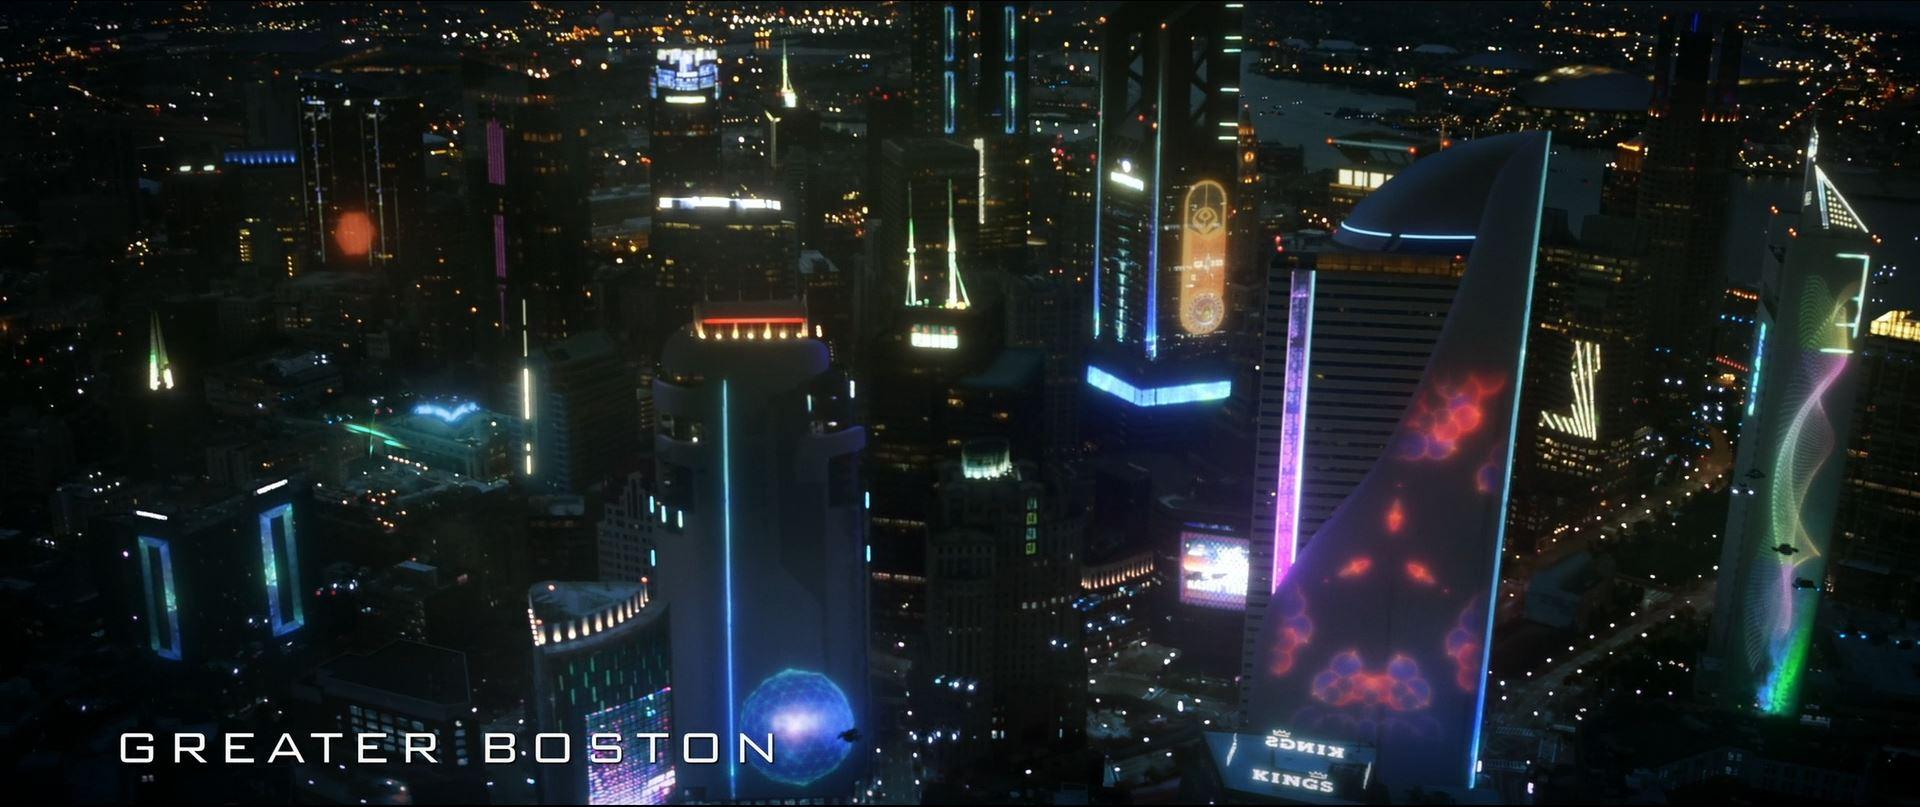 Star Trek Picard - Greater Boston Area